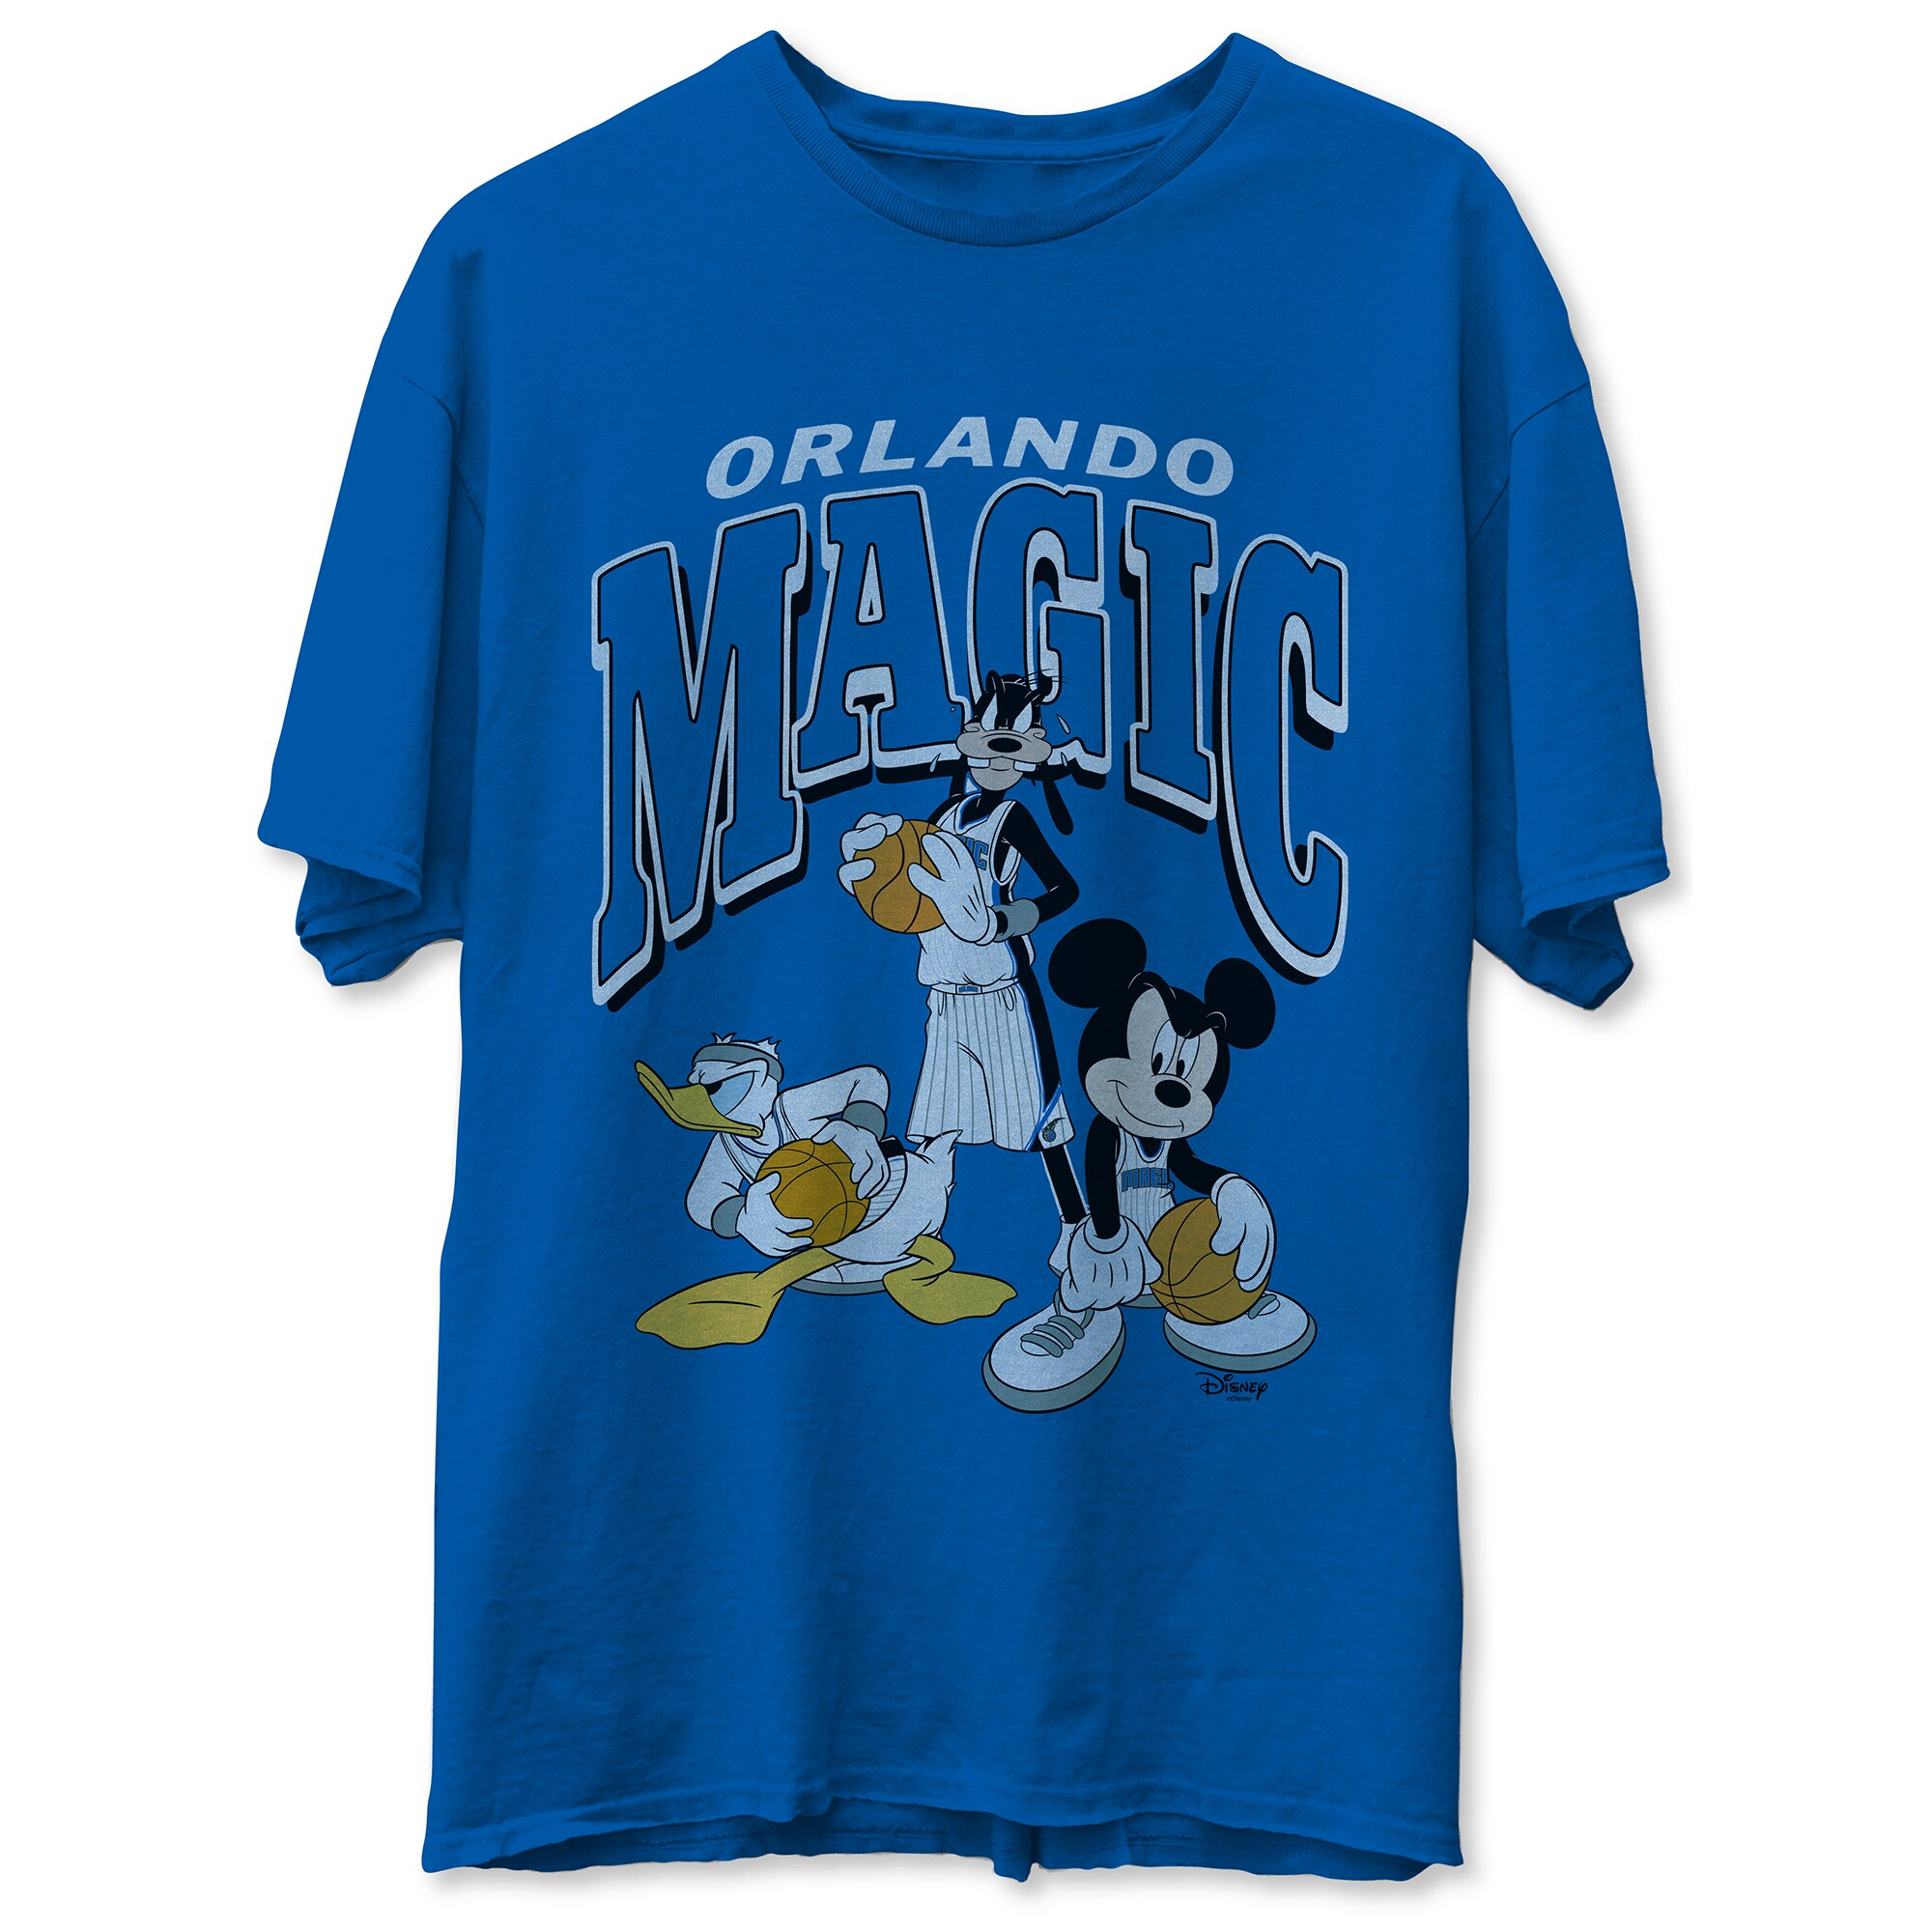 Orlando Magic Junk Food Disney Mickey Squad T-Shirt - Royal